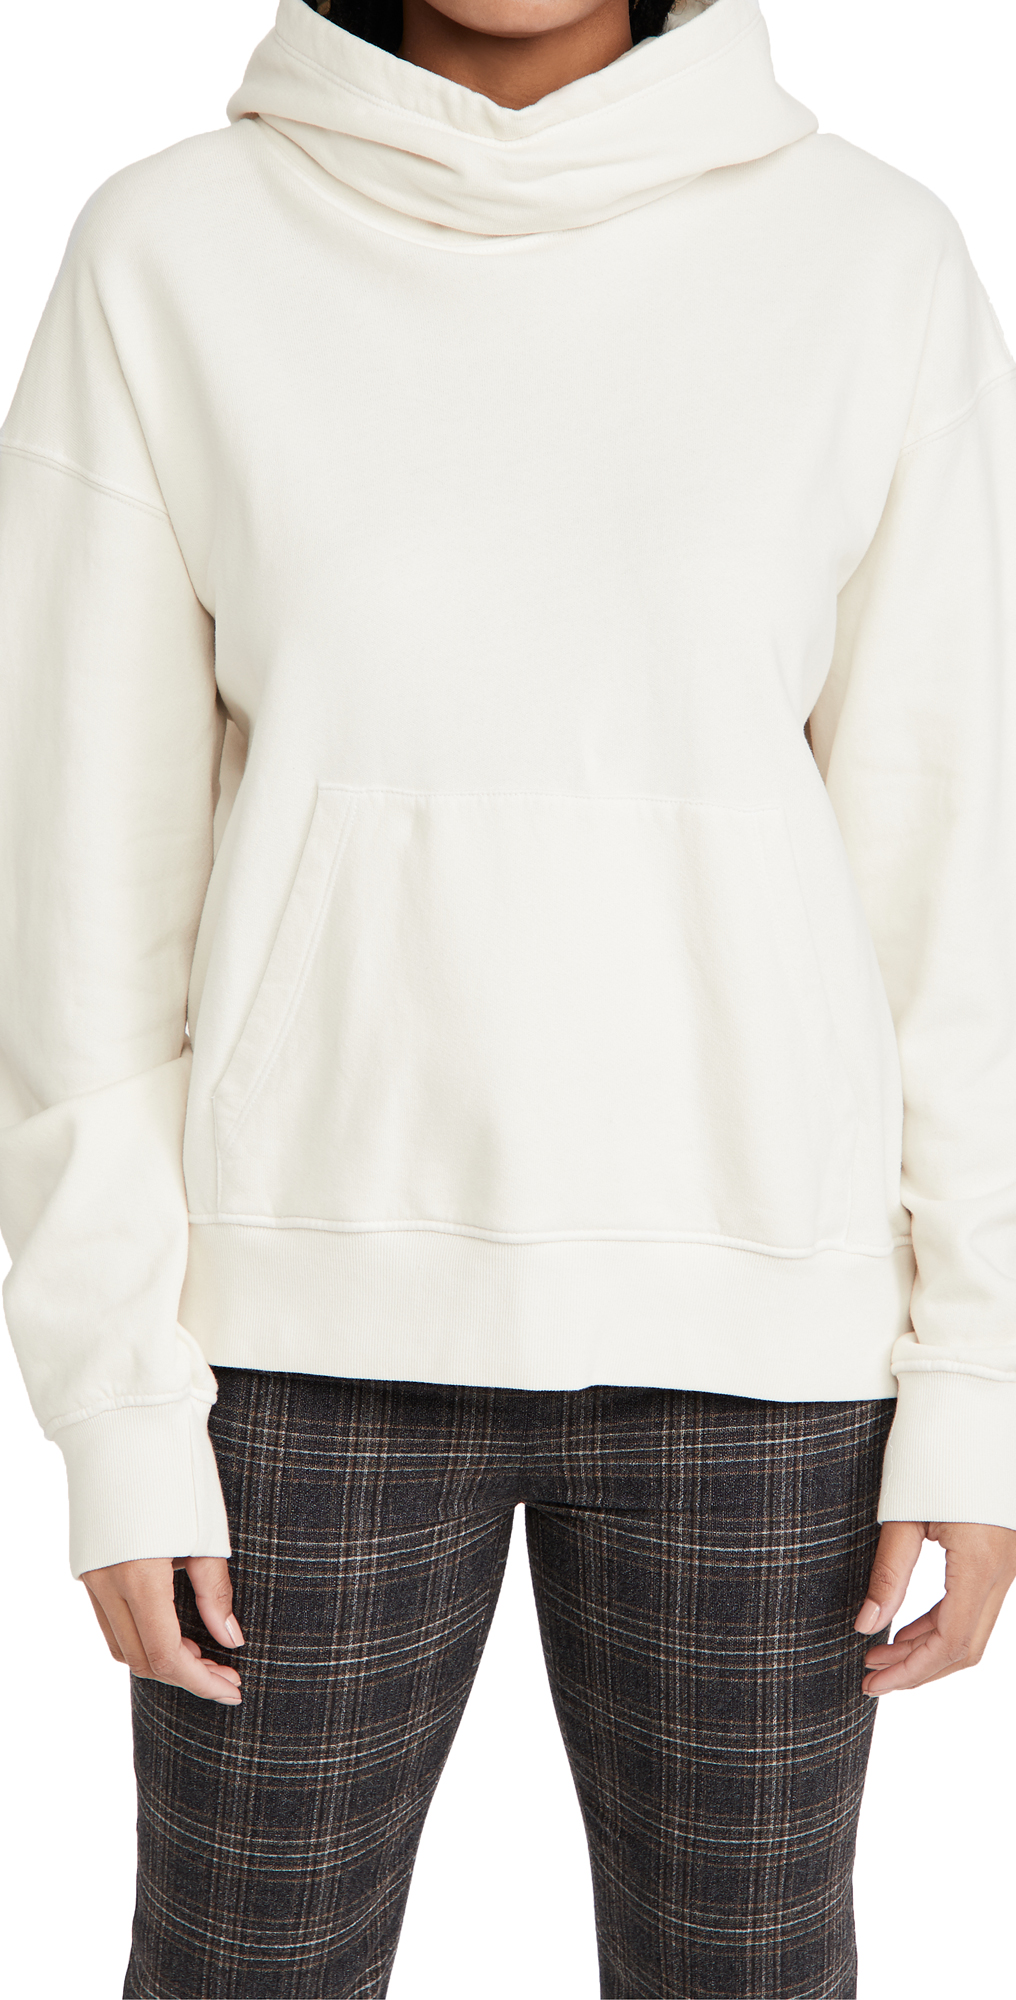 Velvet Ora04 Sweatshirt